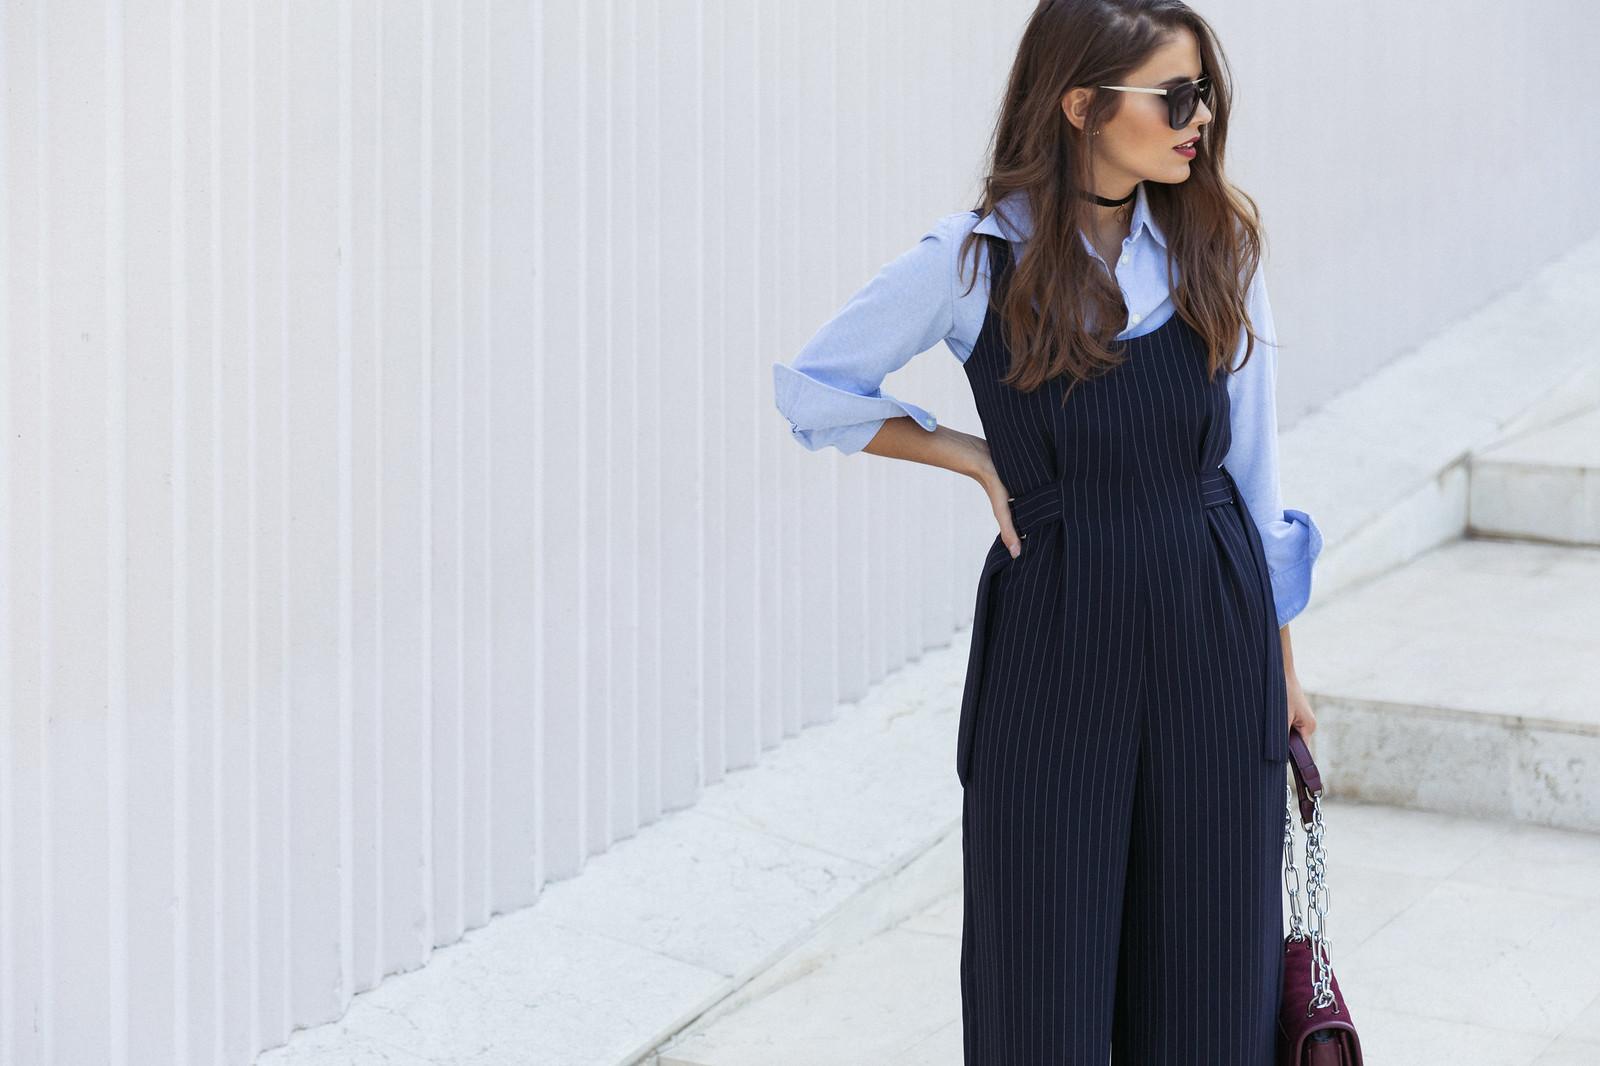 Jessie Chanes Seams for a desire - Pinstripped suit topshop heeled sandals schutz parfois bag  -2